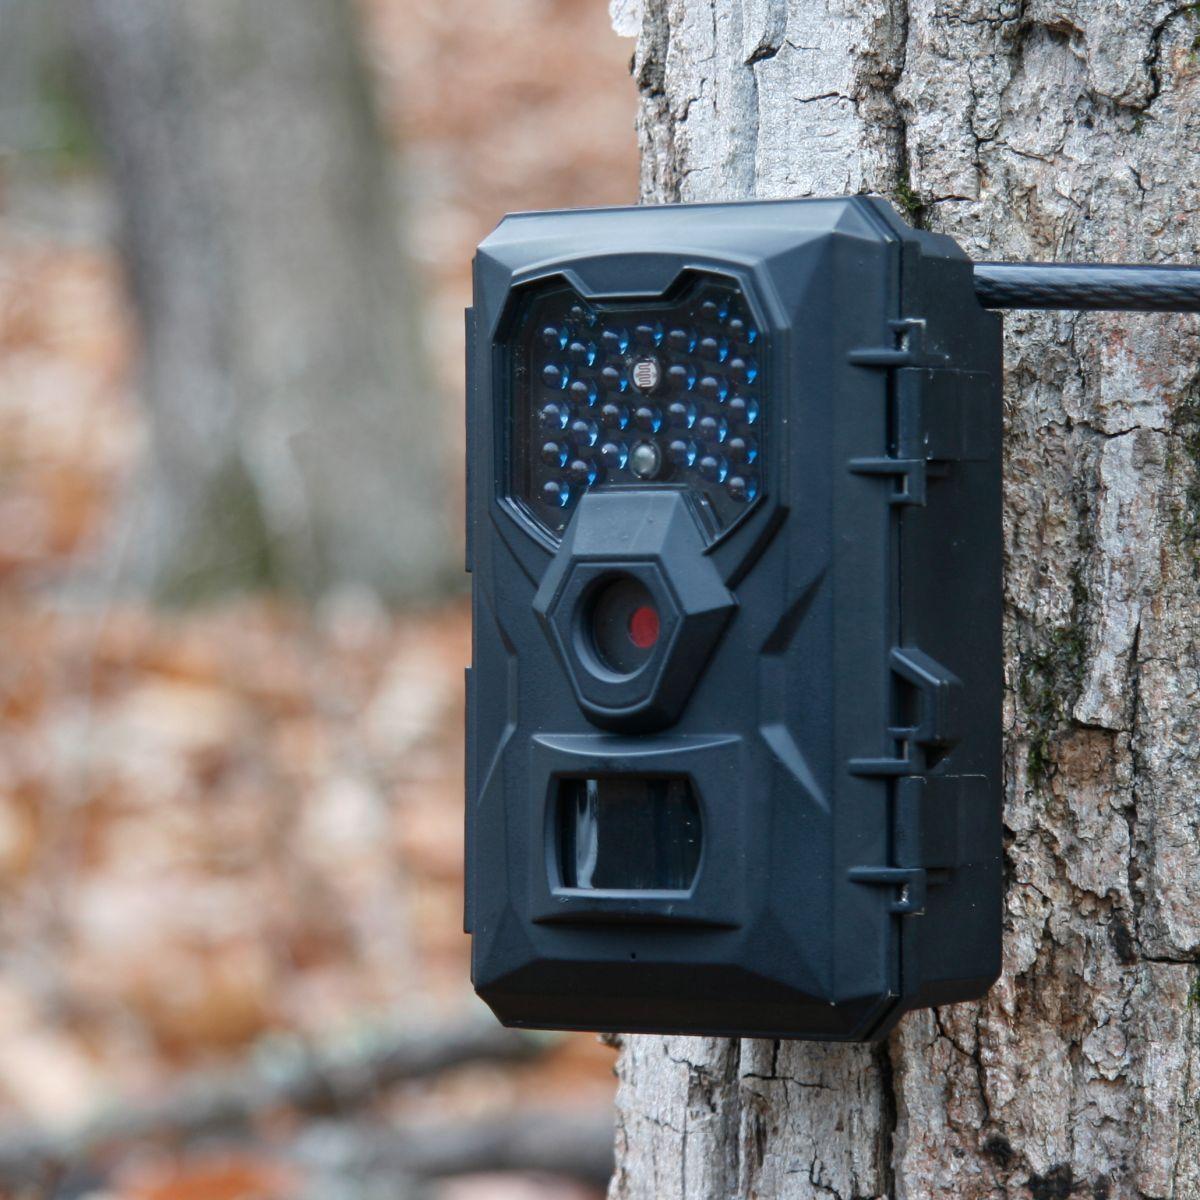 Bester Preis - UWAY U250B IR Scouting Camera w Free Security Box 5 PC Bundle